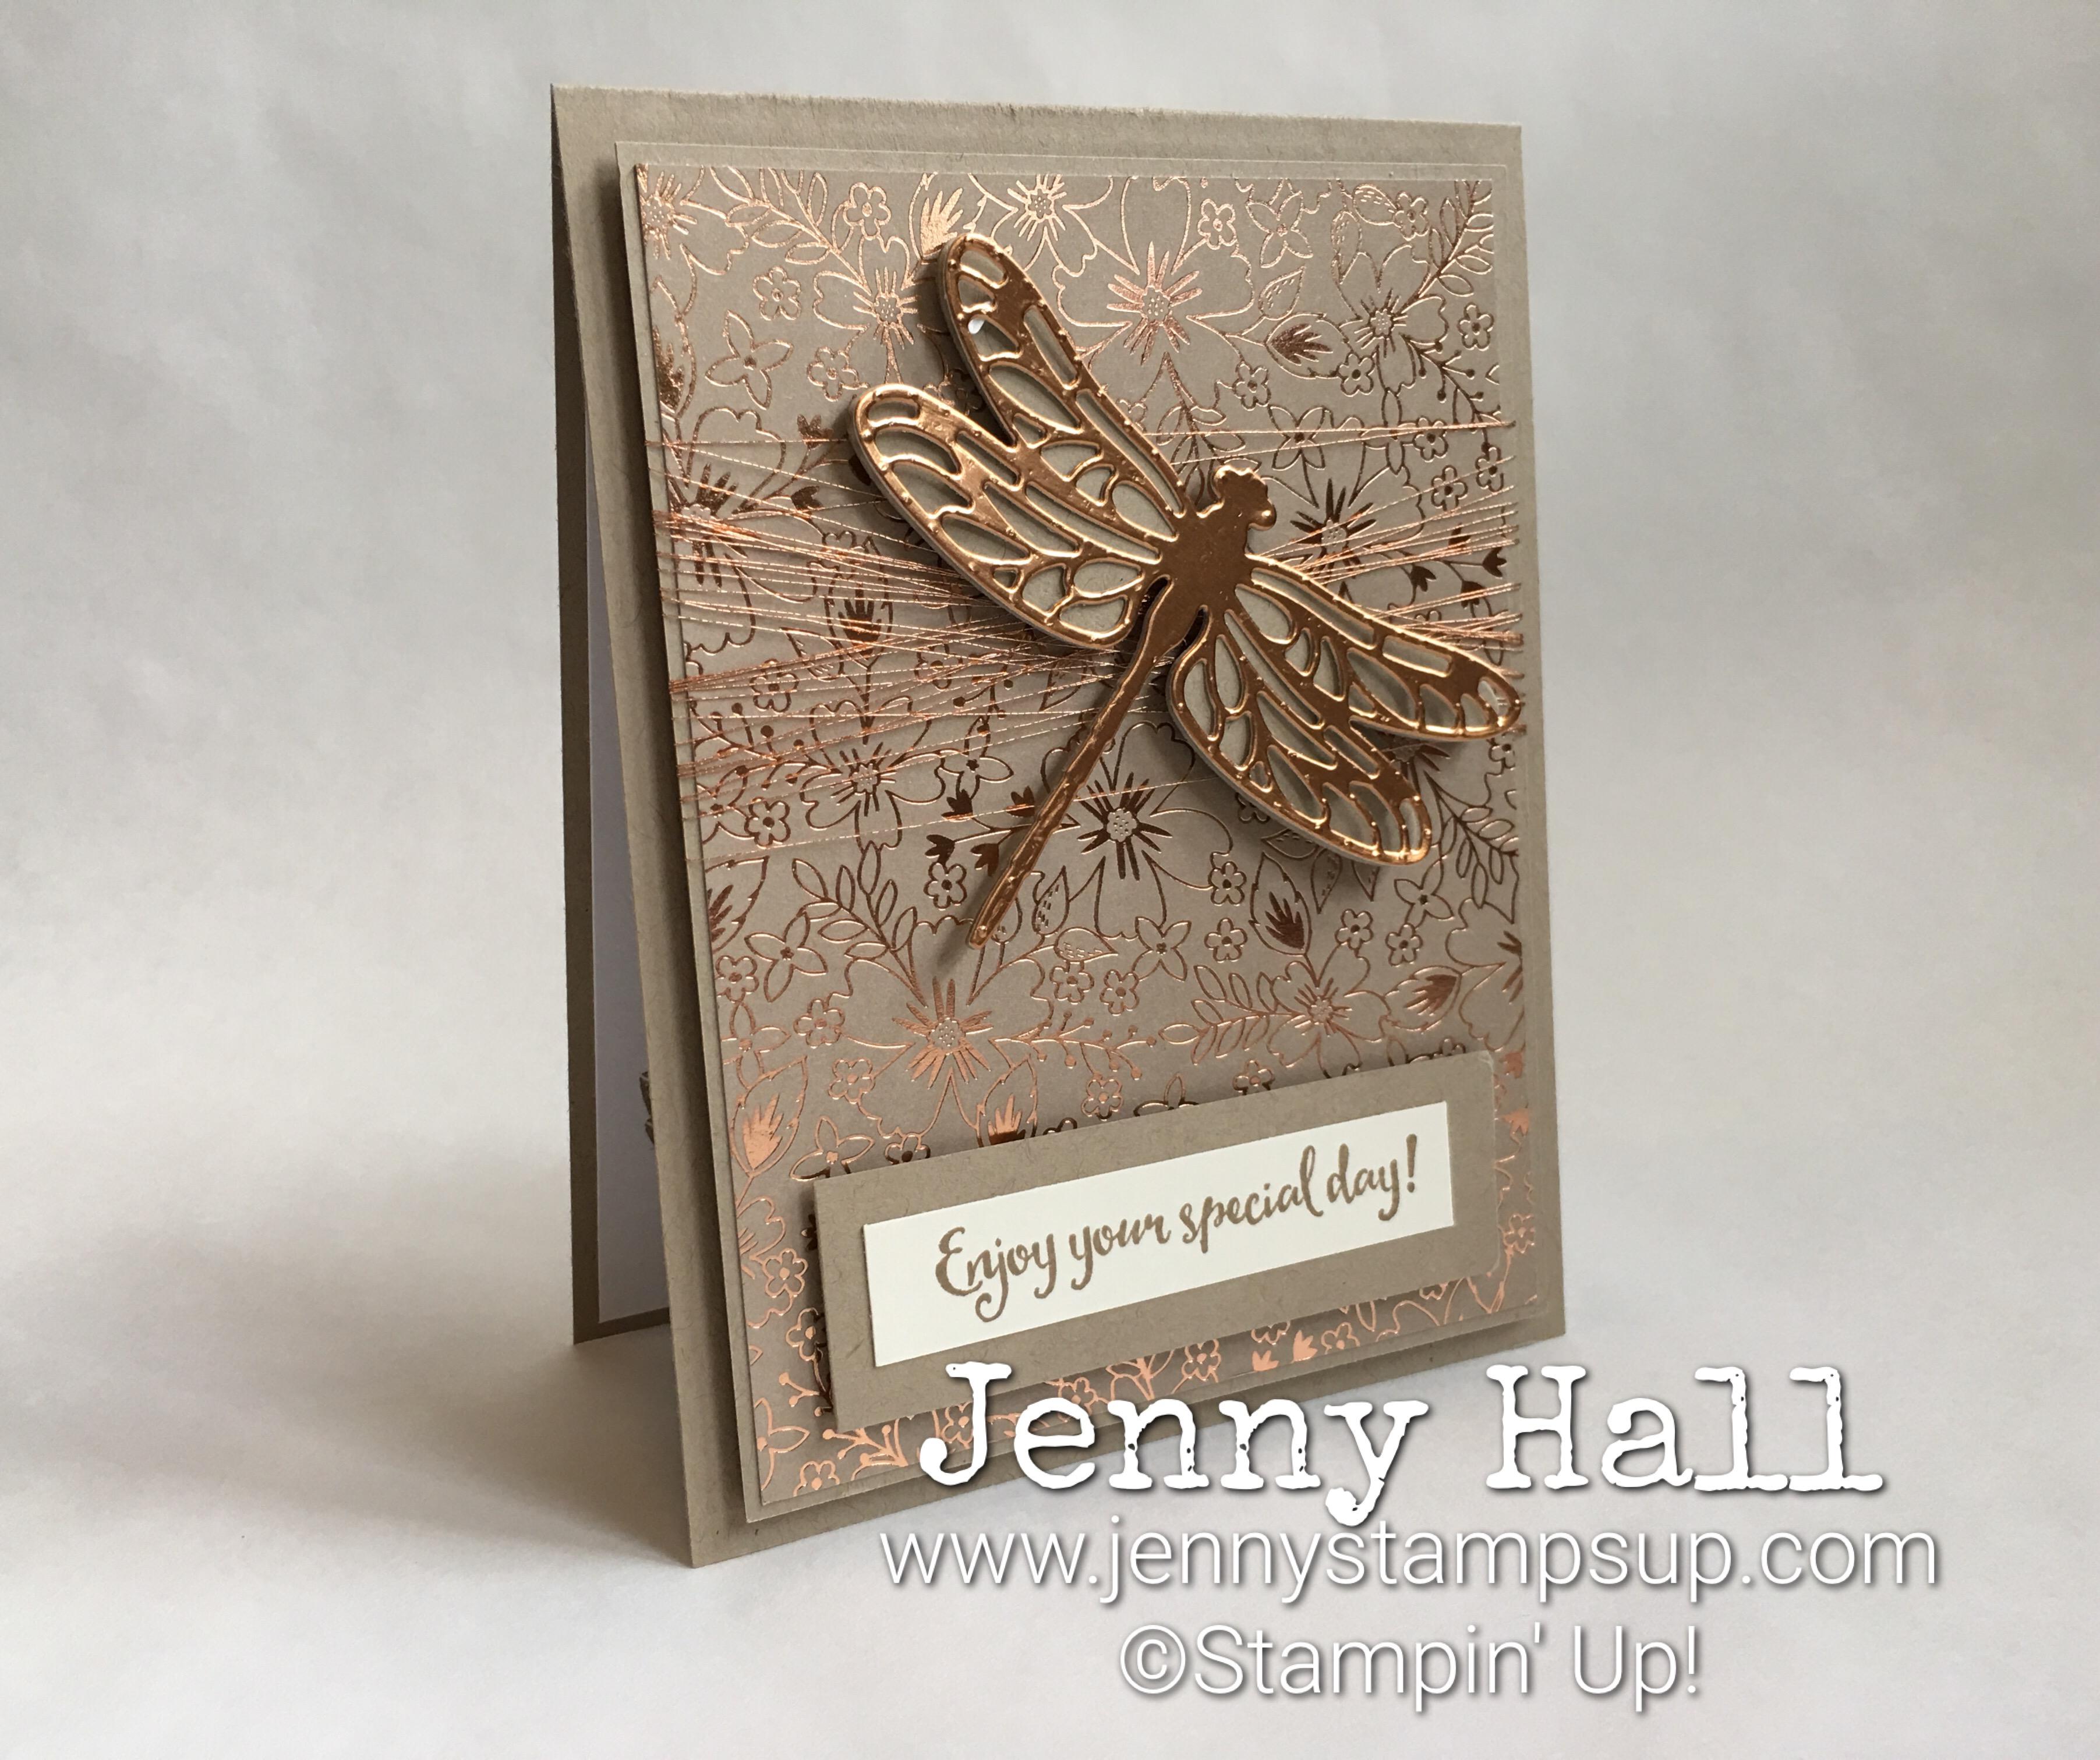 Dragonfly Dreams by Jenny Hall at www.jennyhalldesign.com